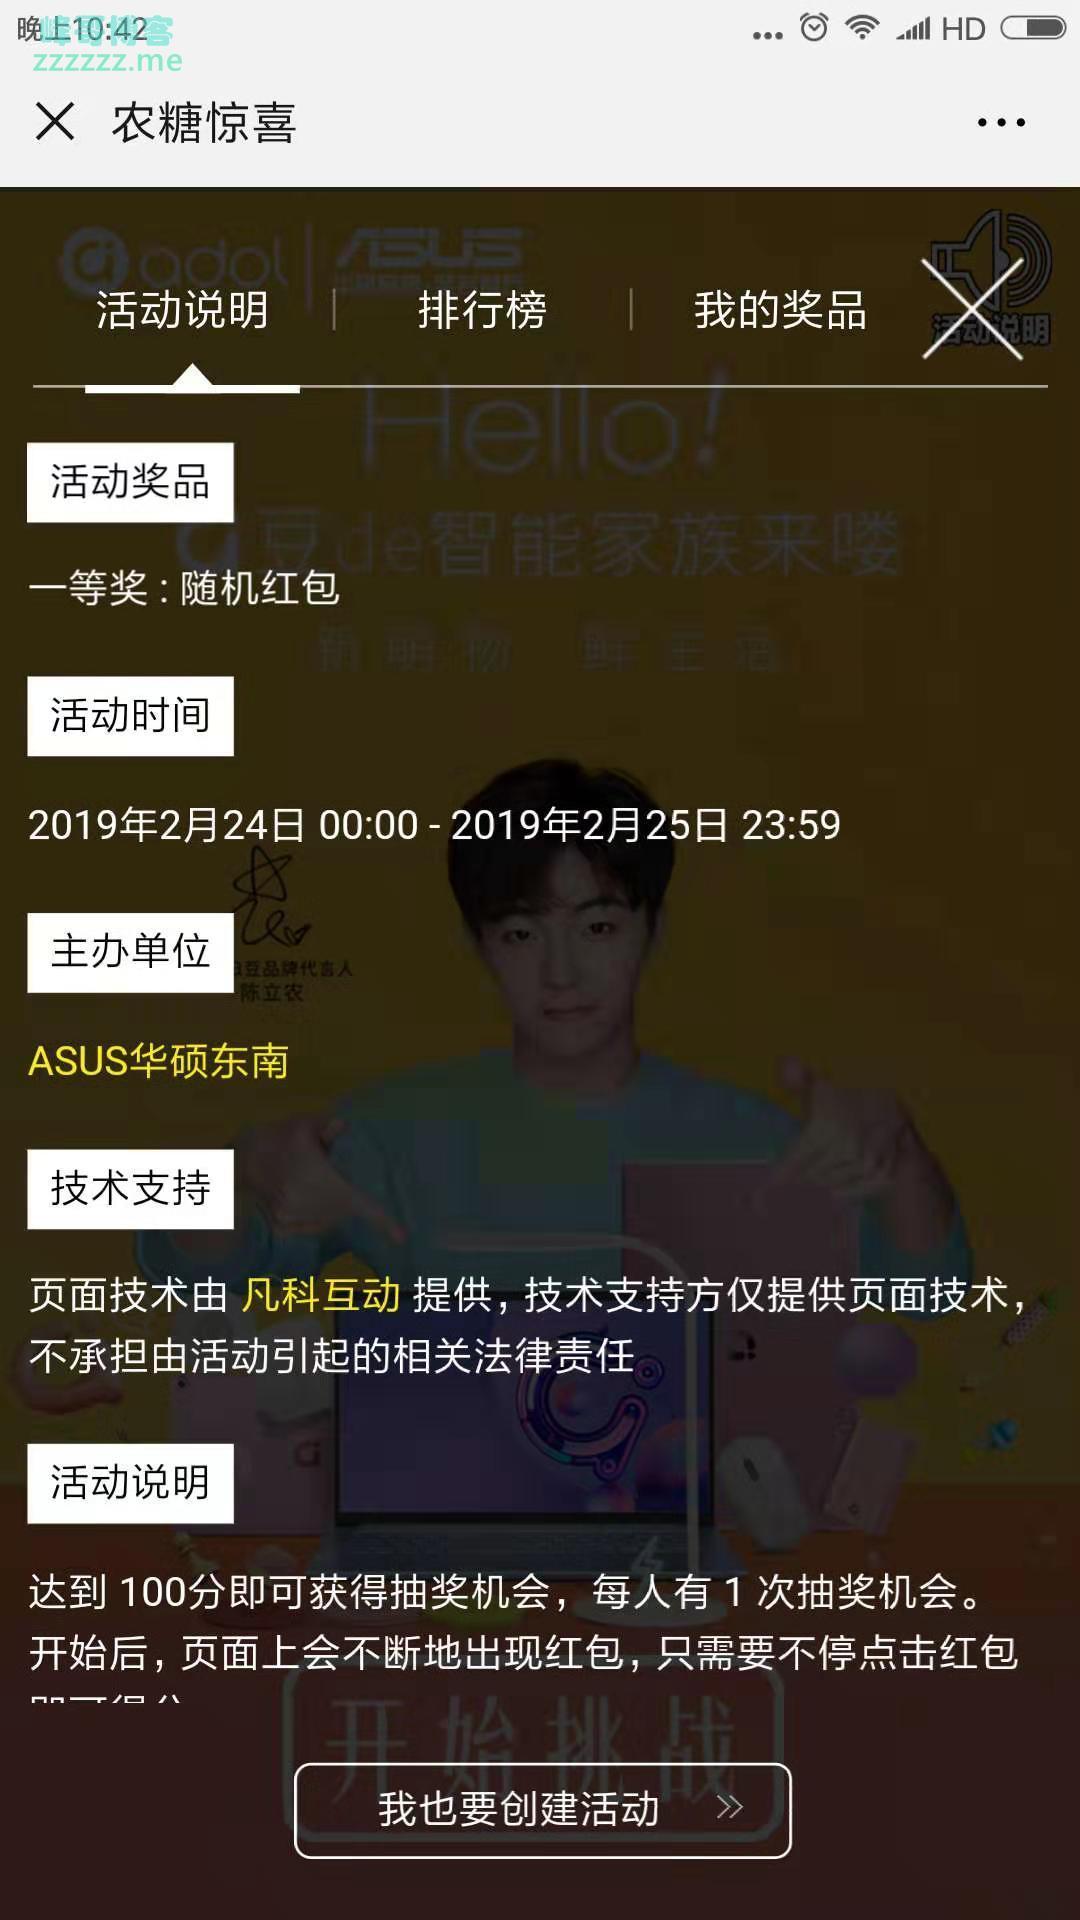 <ASUS华硕东南>农糖惊喜(截至2月25日)